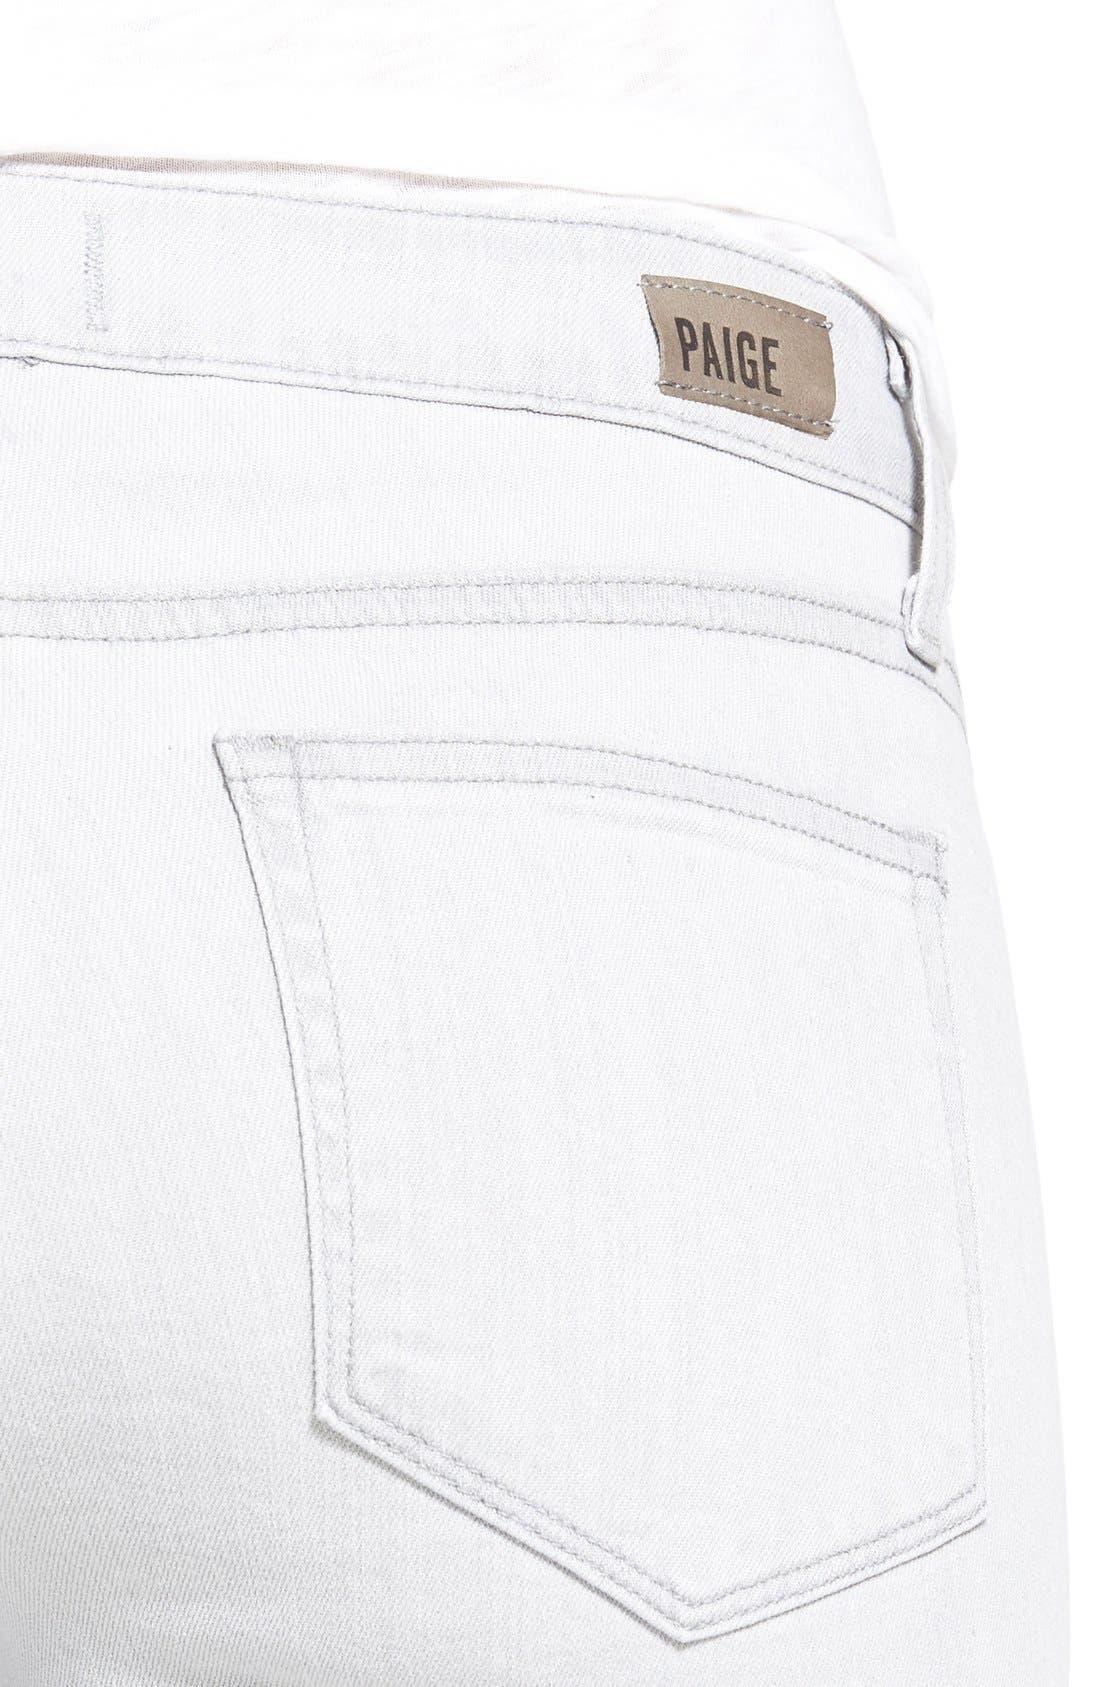 Alternate Image 4  - PaigeDenim 'Verdugo' Ankle Ultra Skinny Jeans (Light Grey/Silver Solstice)